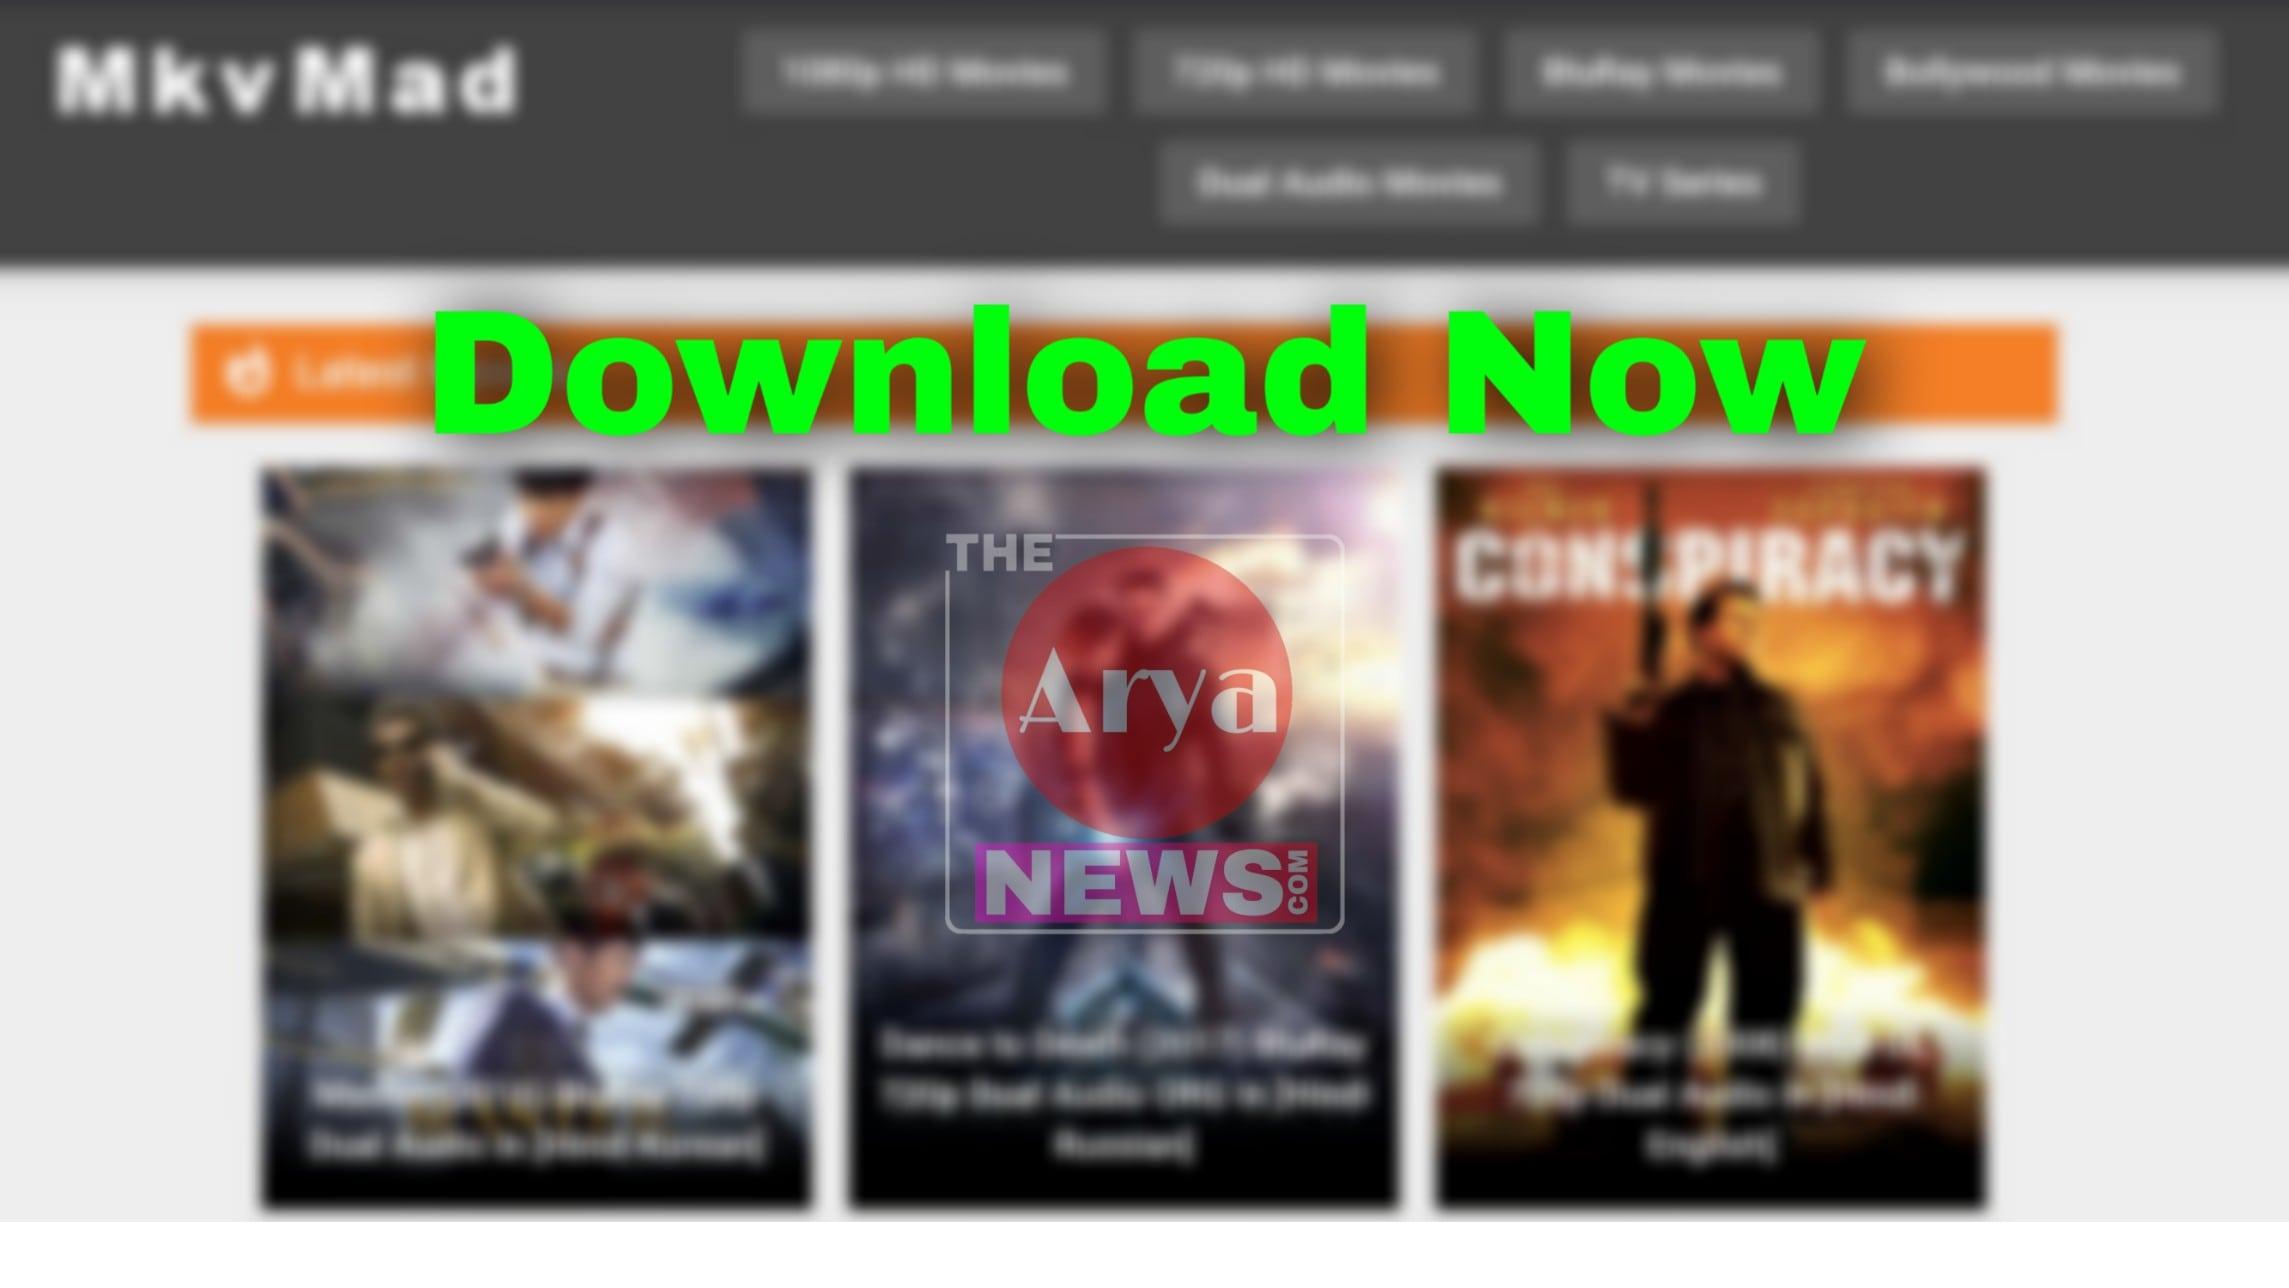 Mkvmad 2020 » download Bollywood, Hollywood Hindi Free Leaked Movie